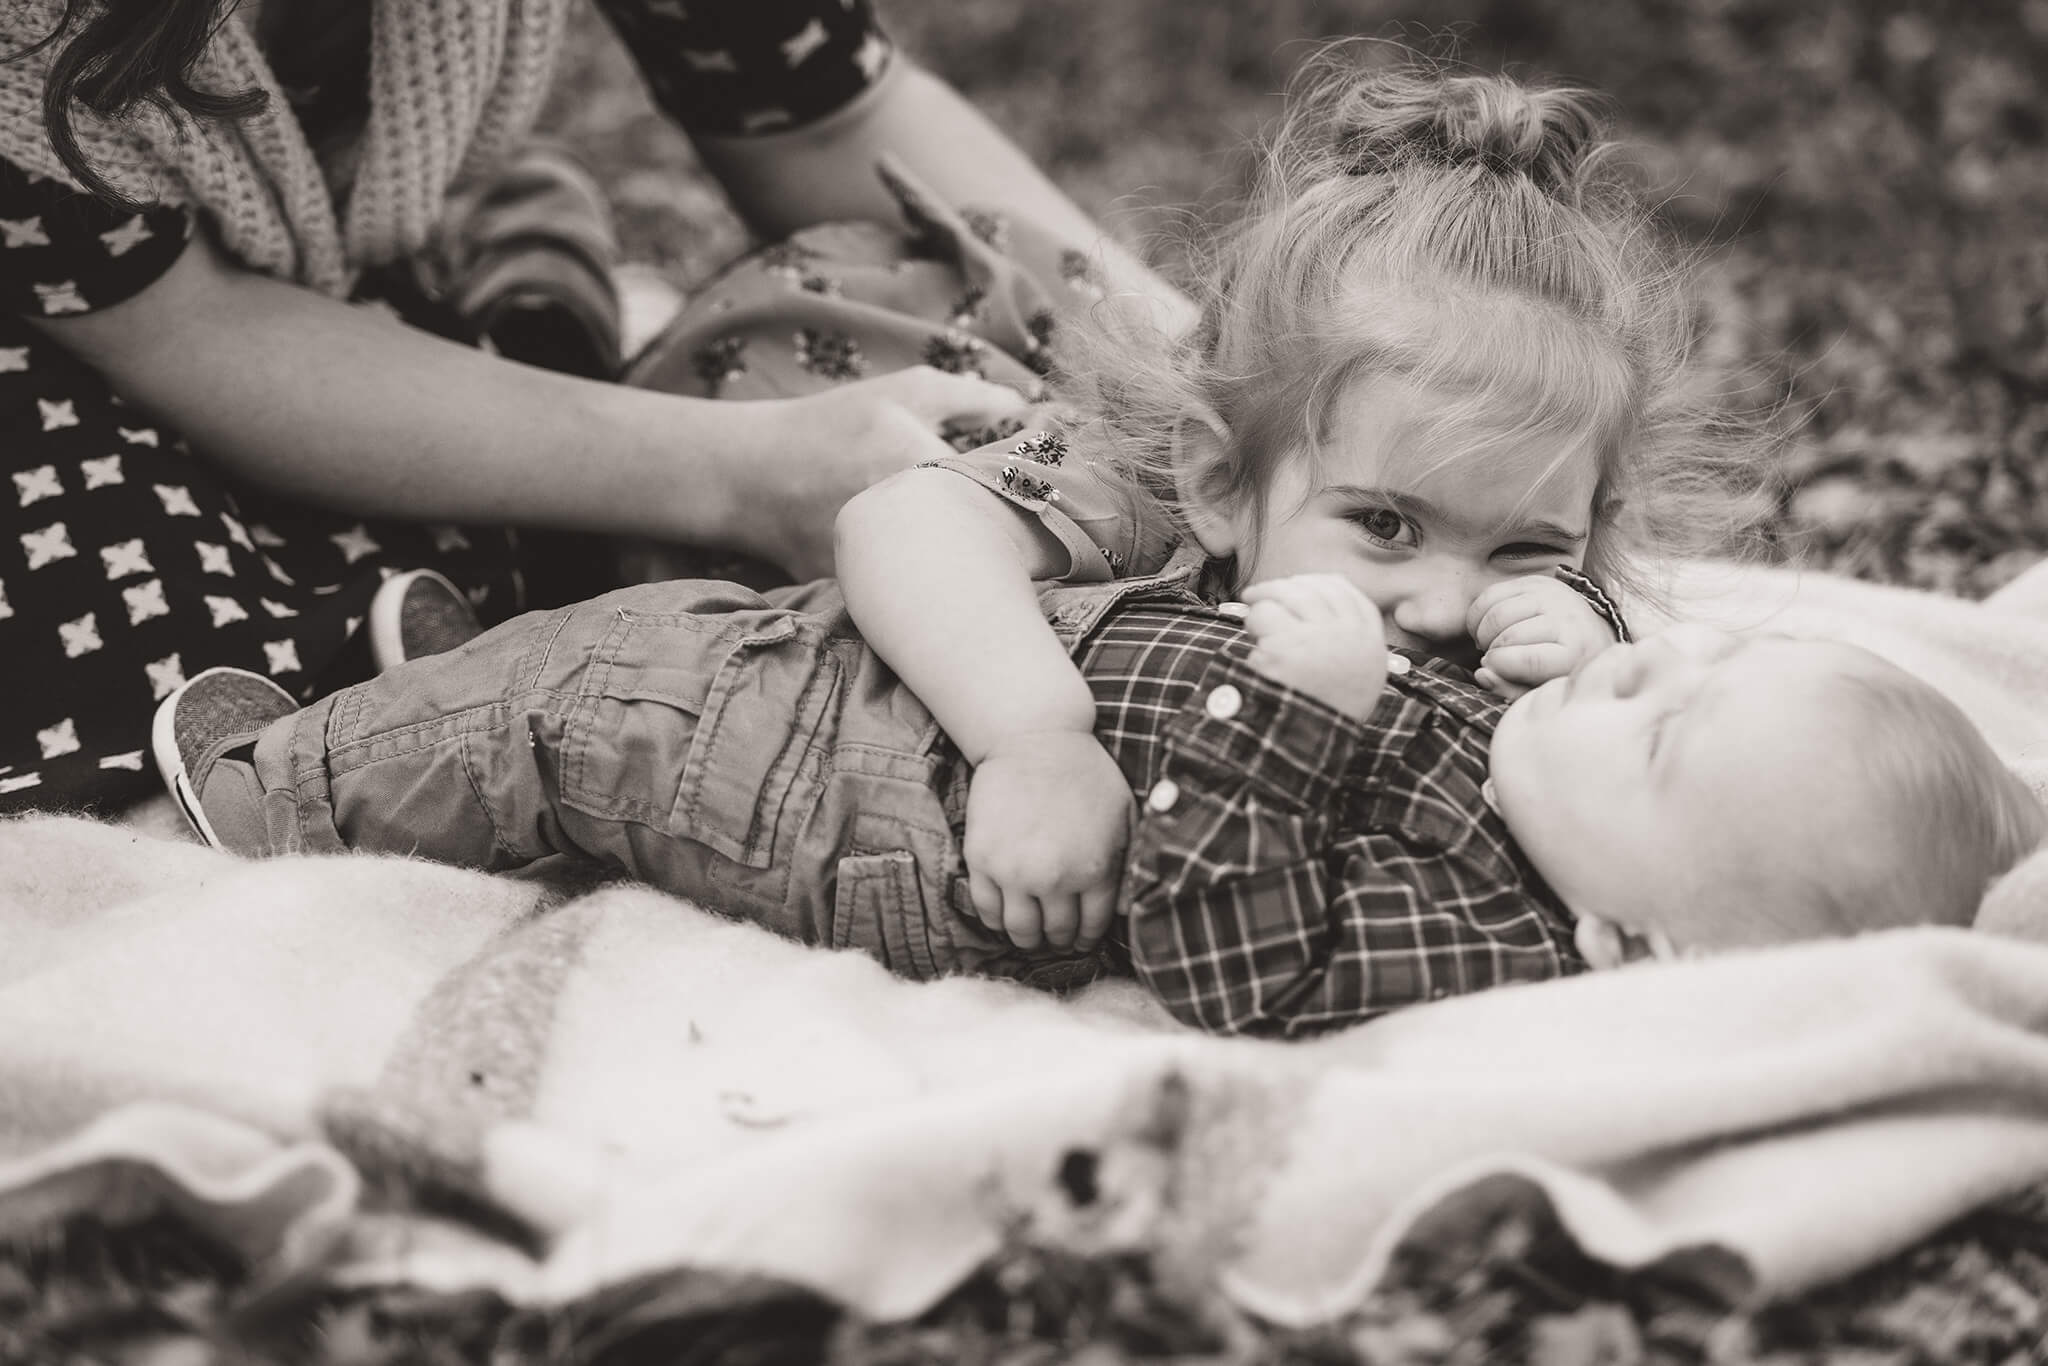 Sister giving baby brother big hugs